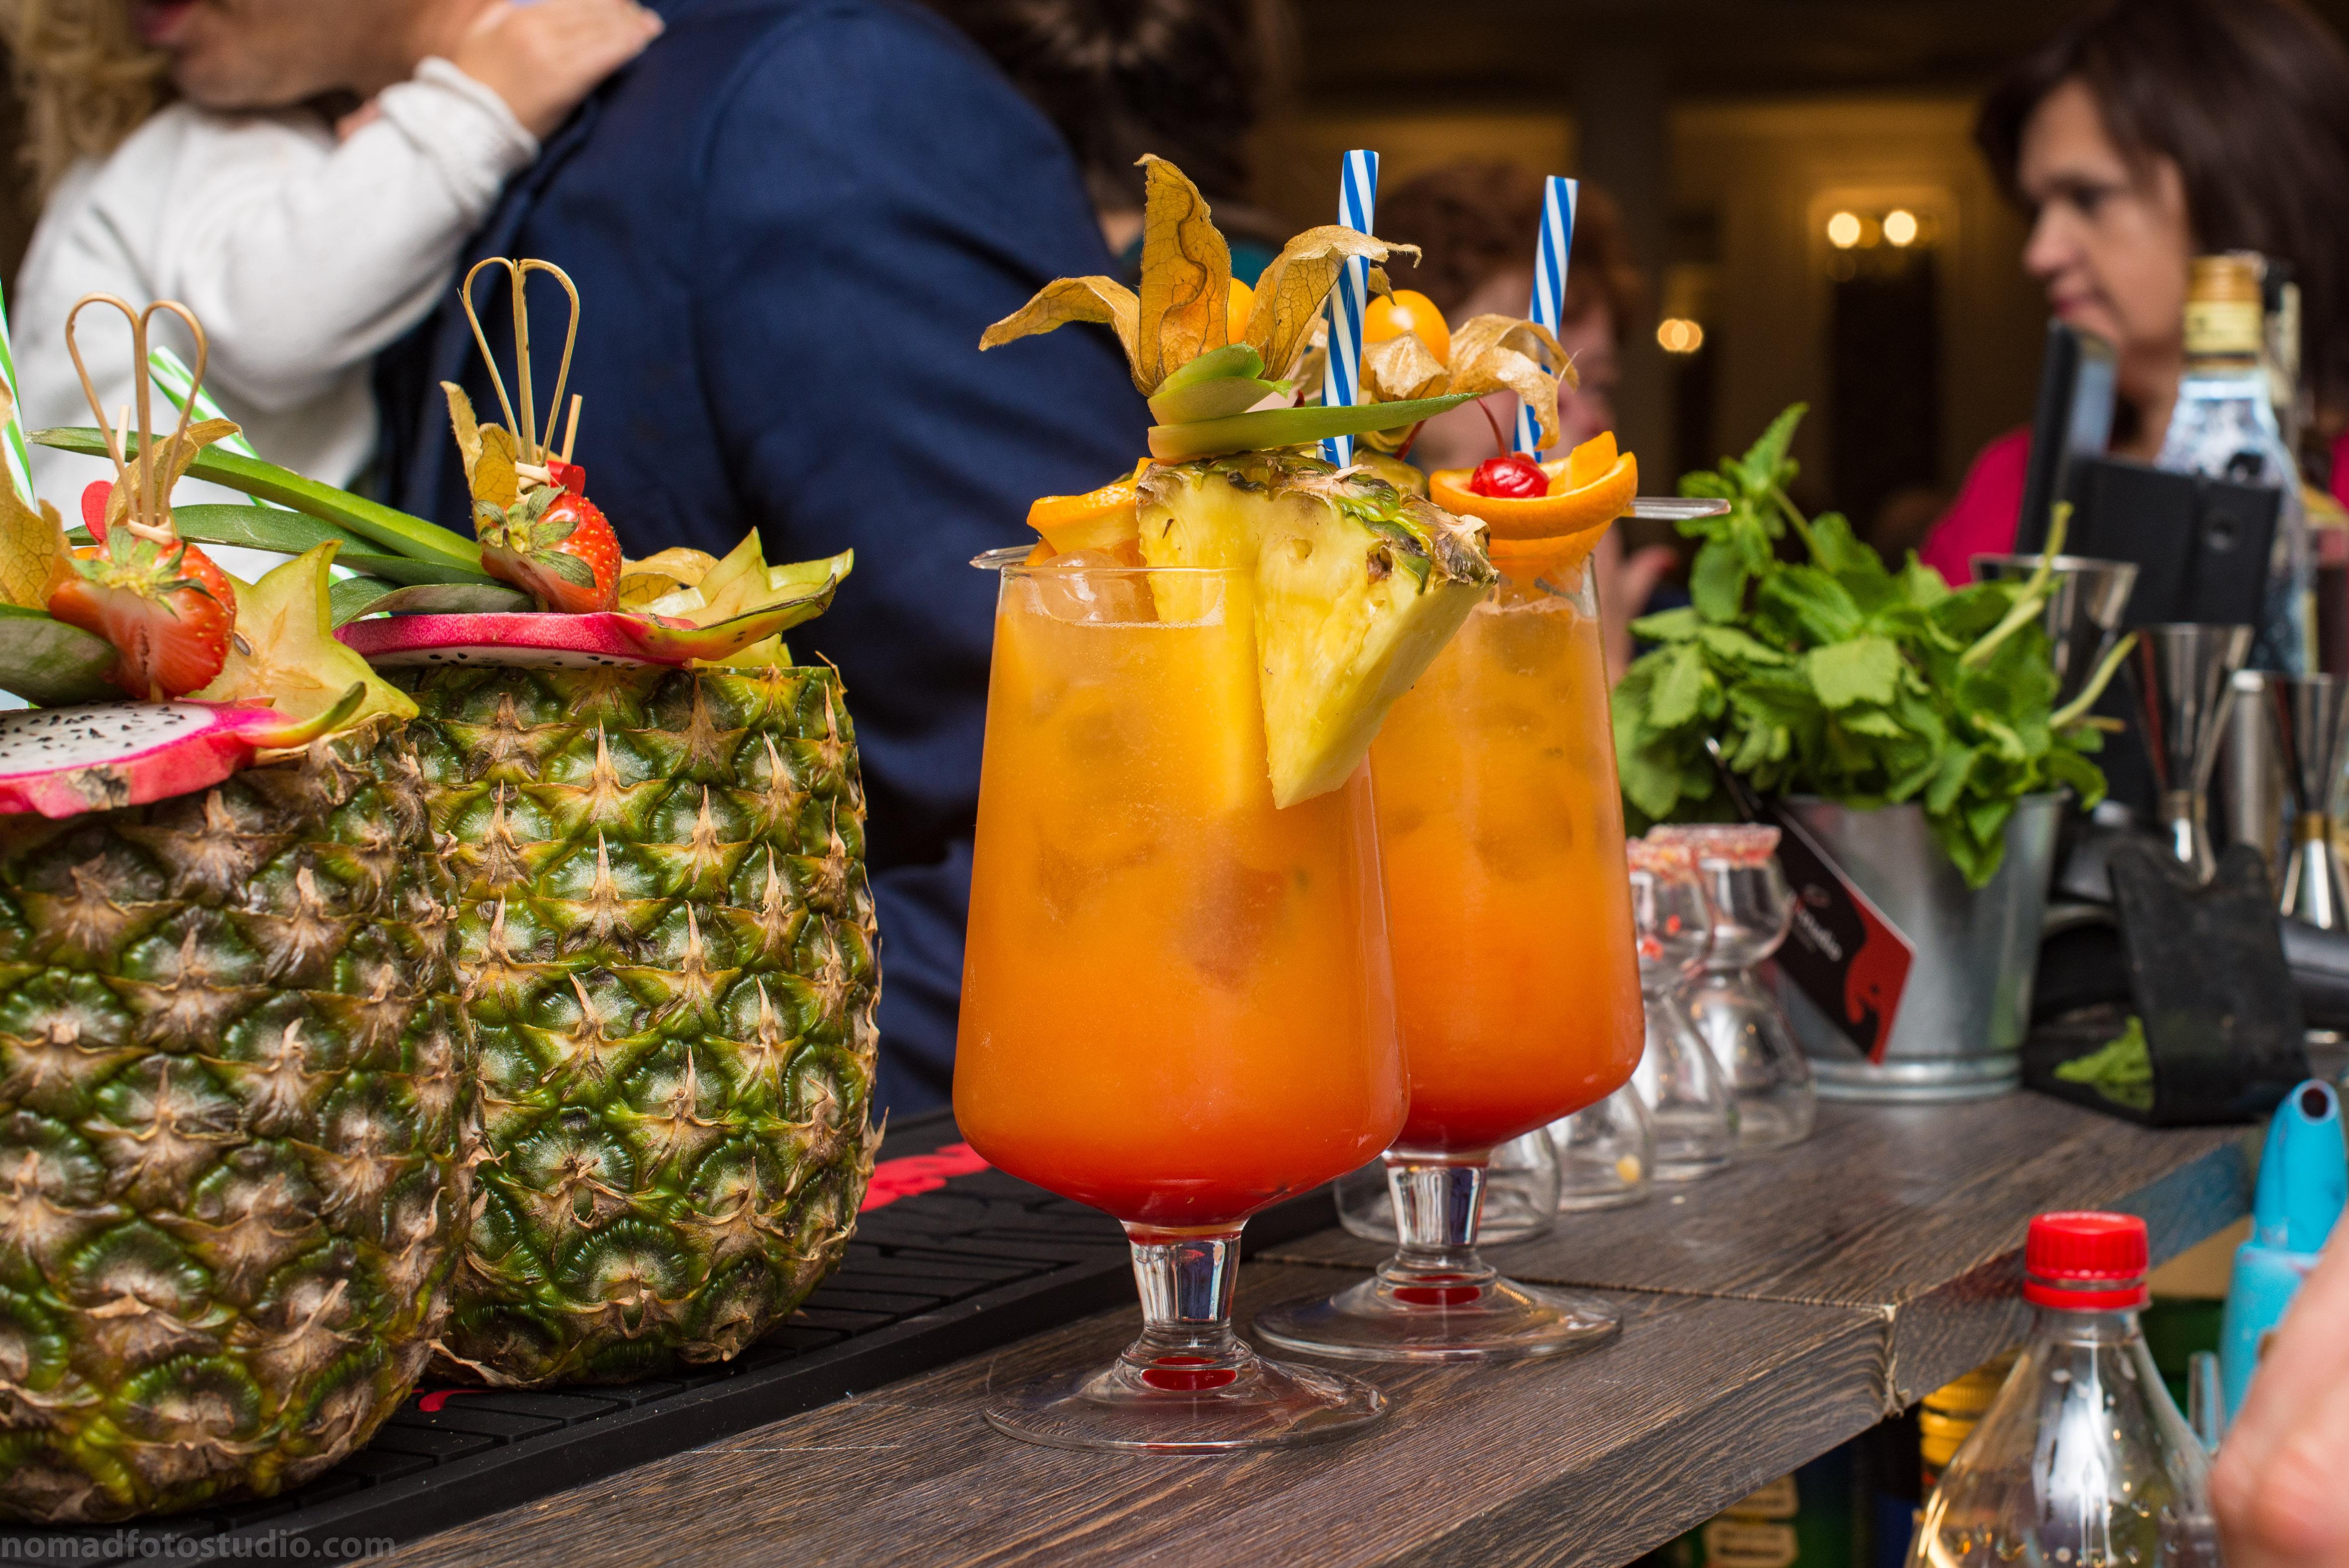 Siedlce-drink-bar-mobilny-barman-na-wesele-evet-agencja-barmańska-drinki-15